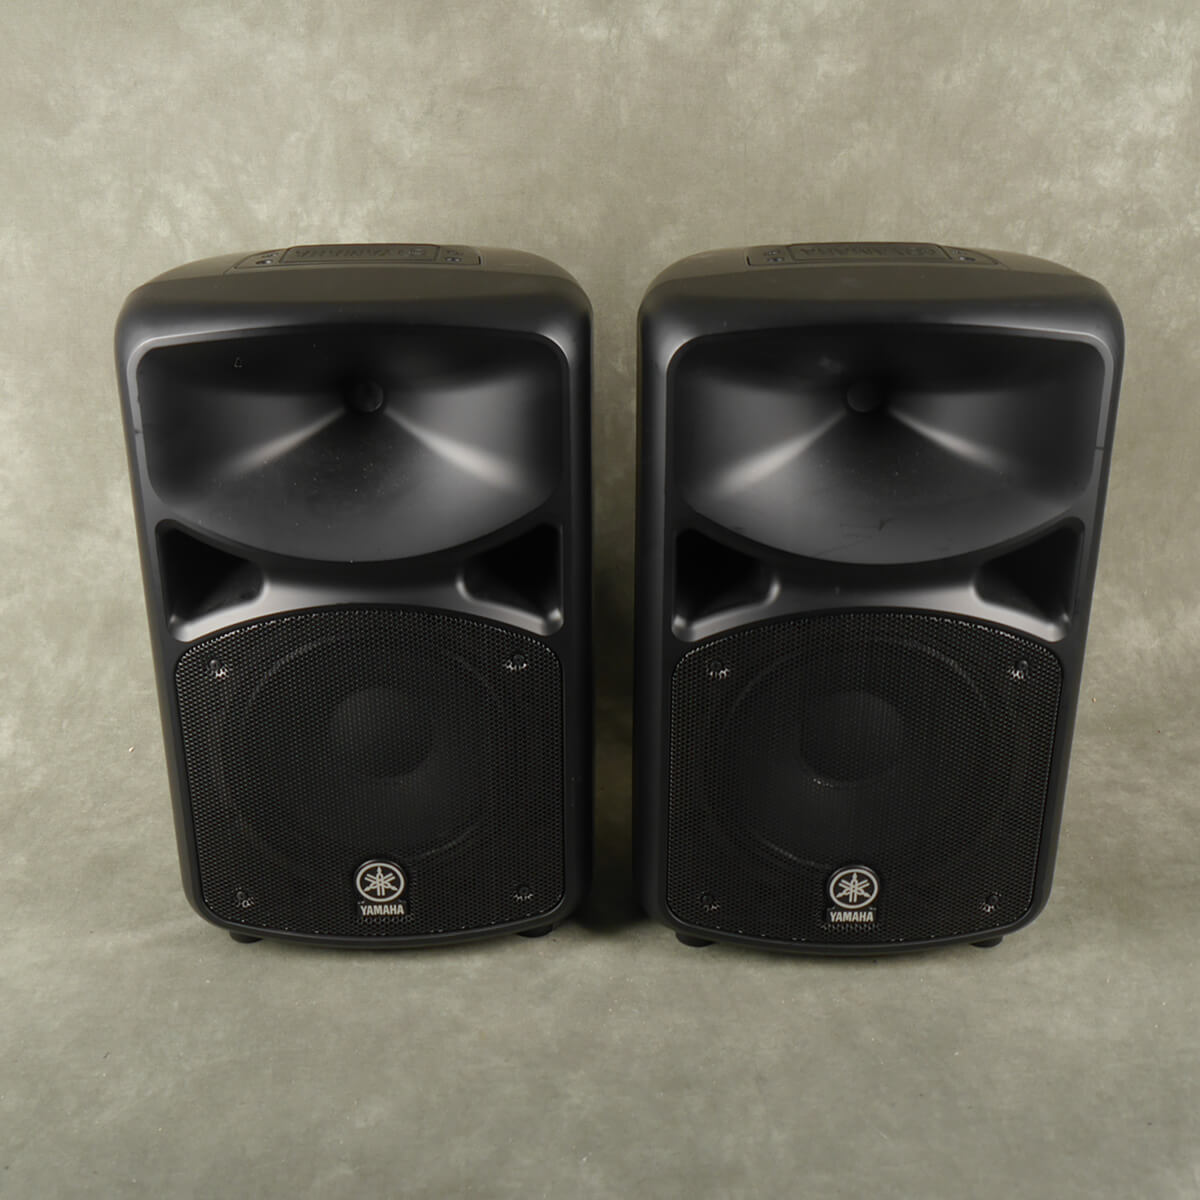 Yamaha Stagepass 600i PA Speakers - 2nd Hand